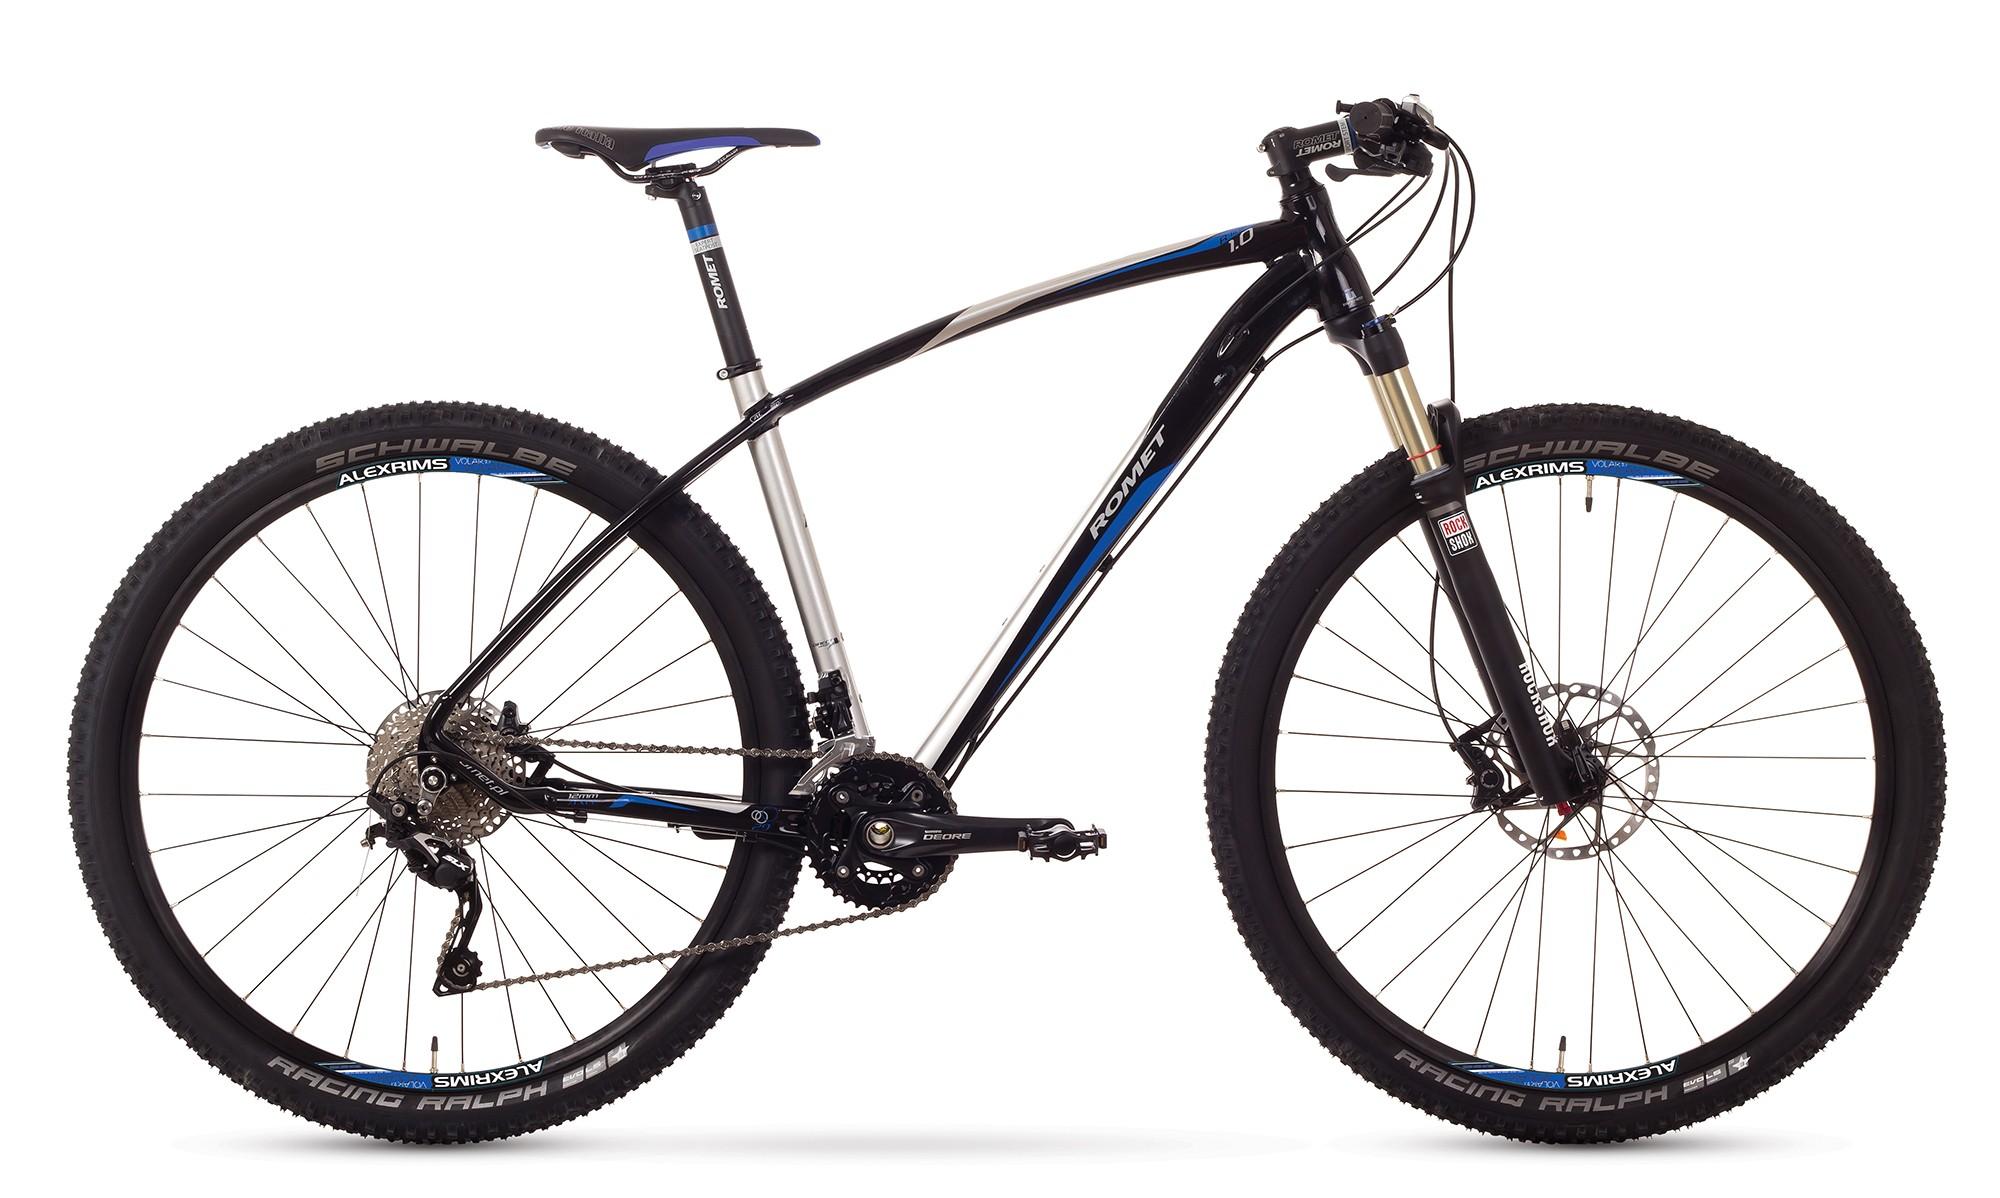 Bicicleta MTB Romet Mustang R-line 29 1.0 - crom-negru-albastru